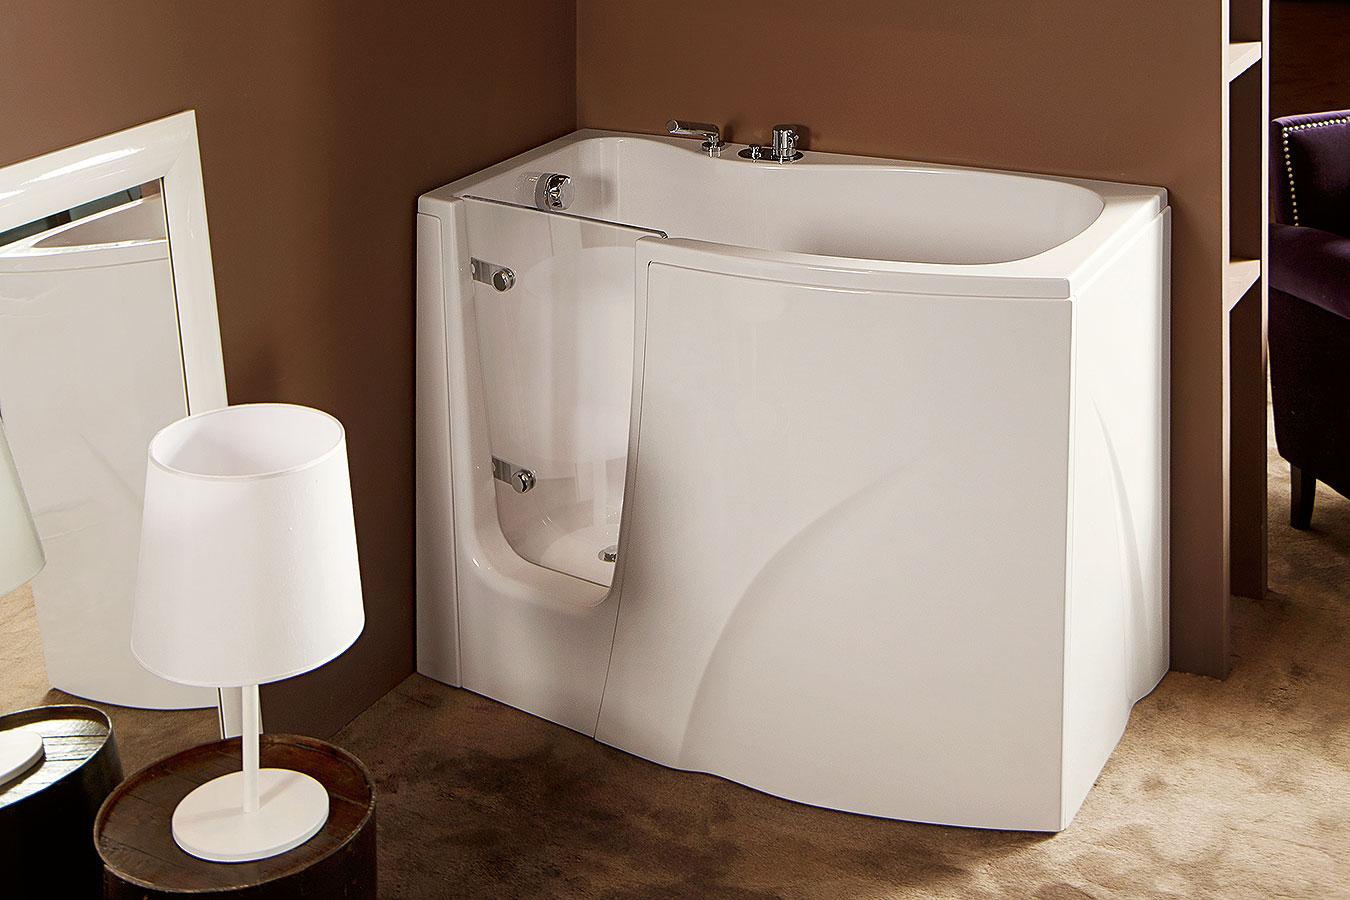 Gen y vasca da bagno per disabili anziani treesse edilceramiche di maccan - Vasca da bagno 120x70 ...